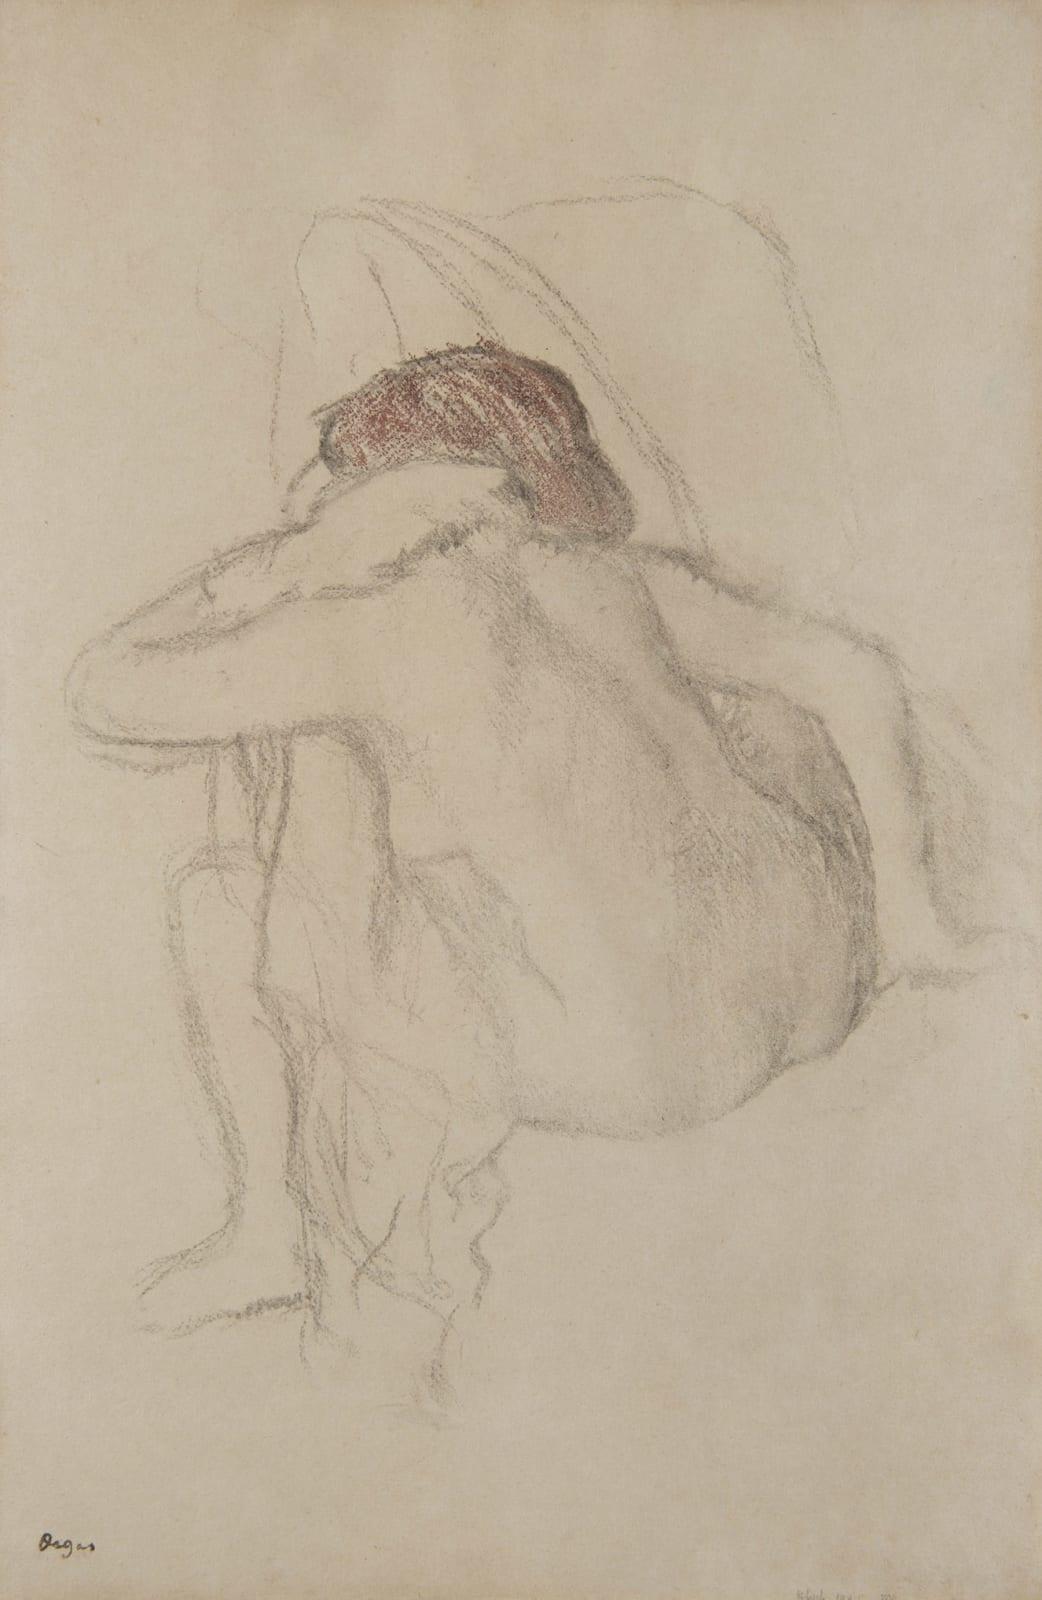 EDGAR DEGAS, Femme s'essuyant, 1888-1892